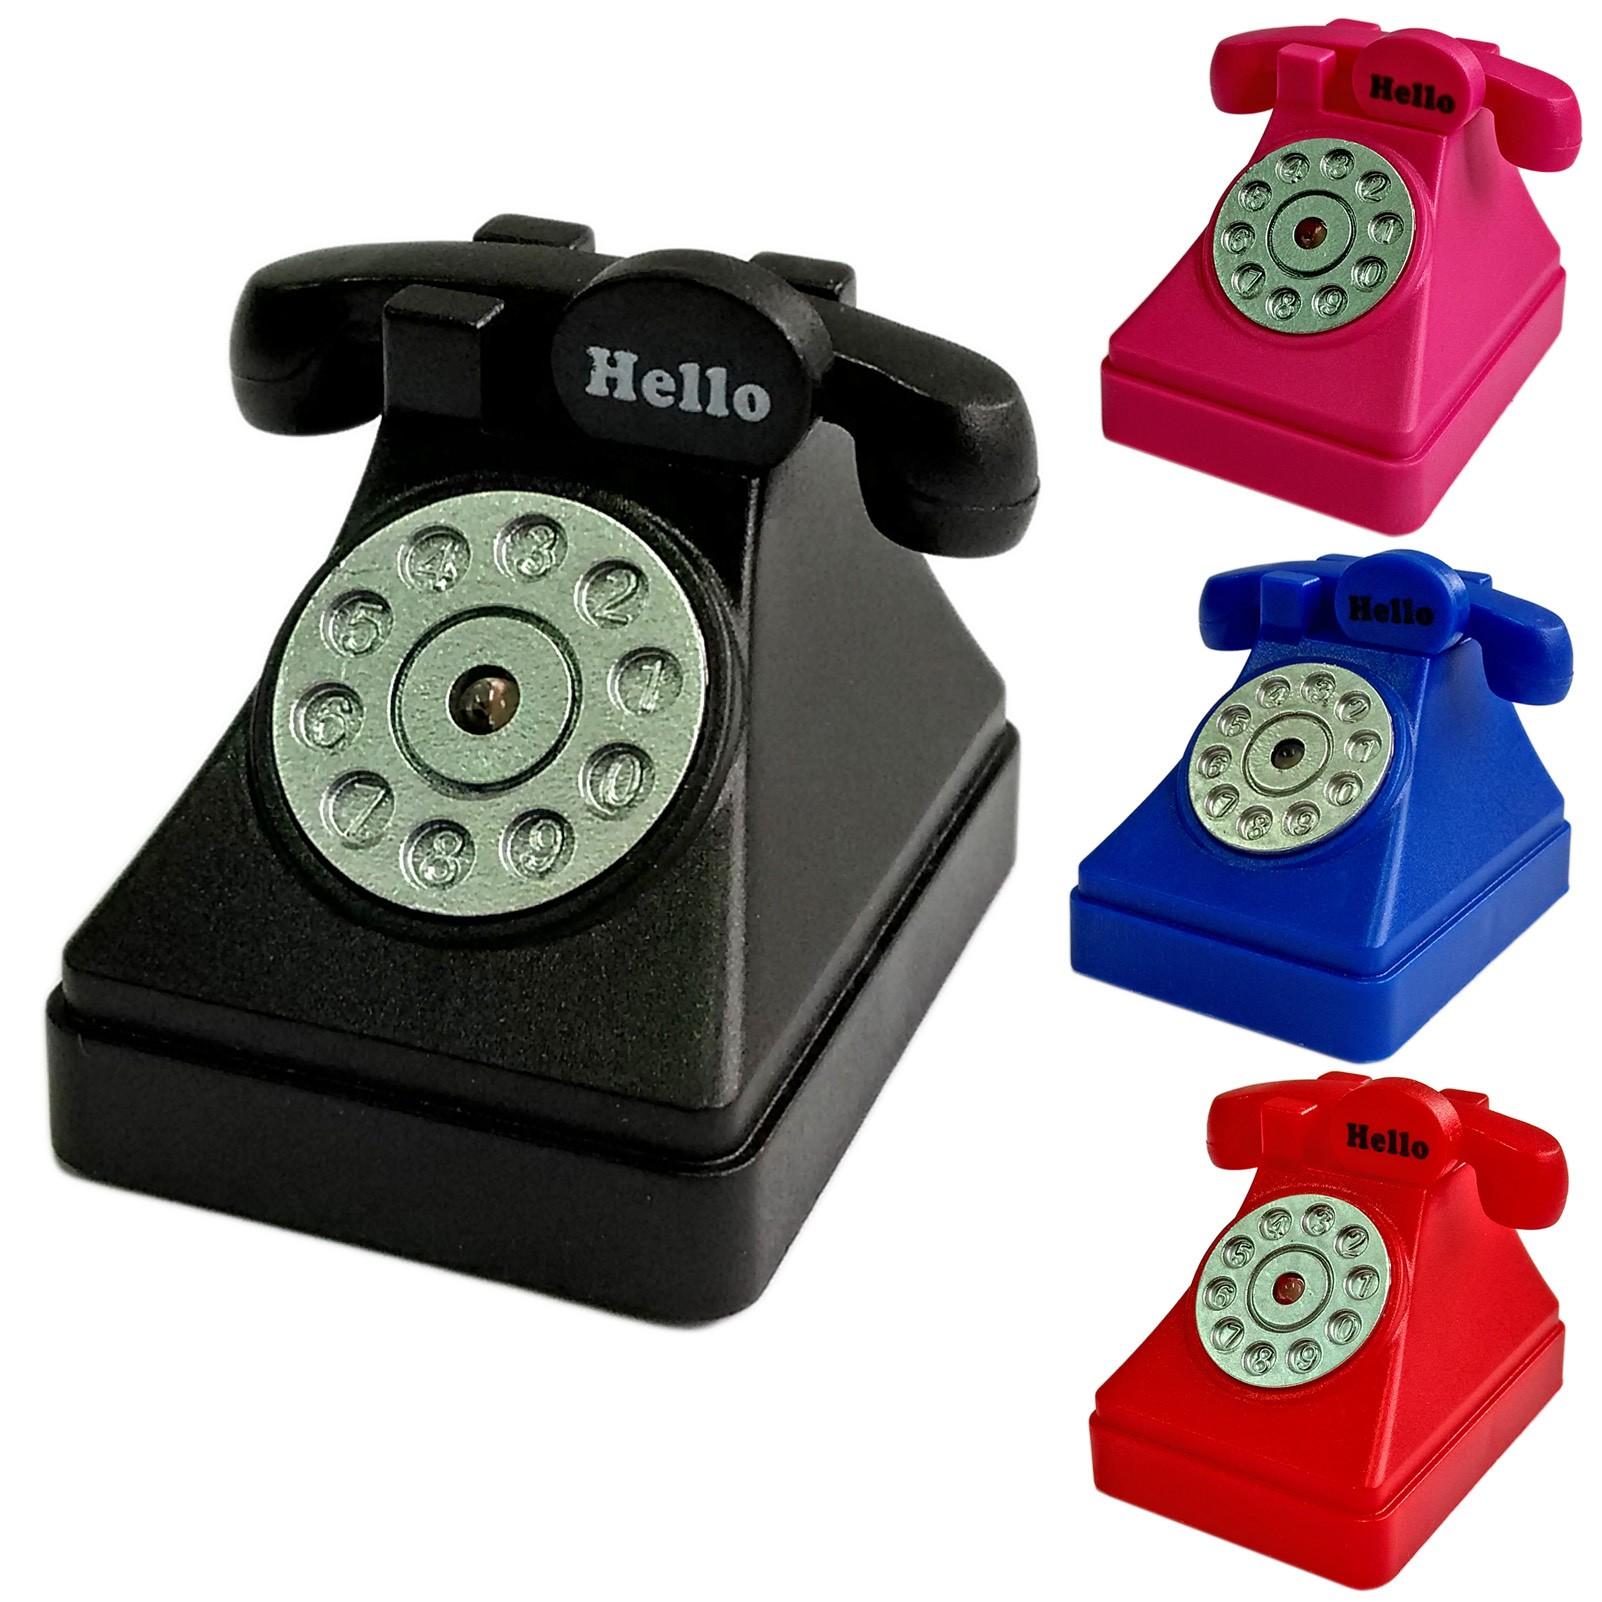 Rotary Telephone 16 for Barbie Monster High Dolls House